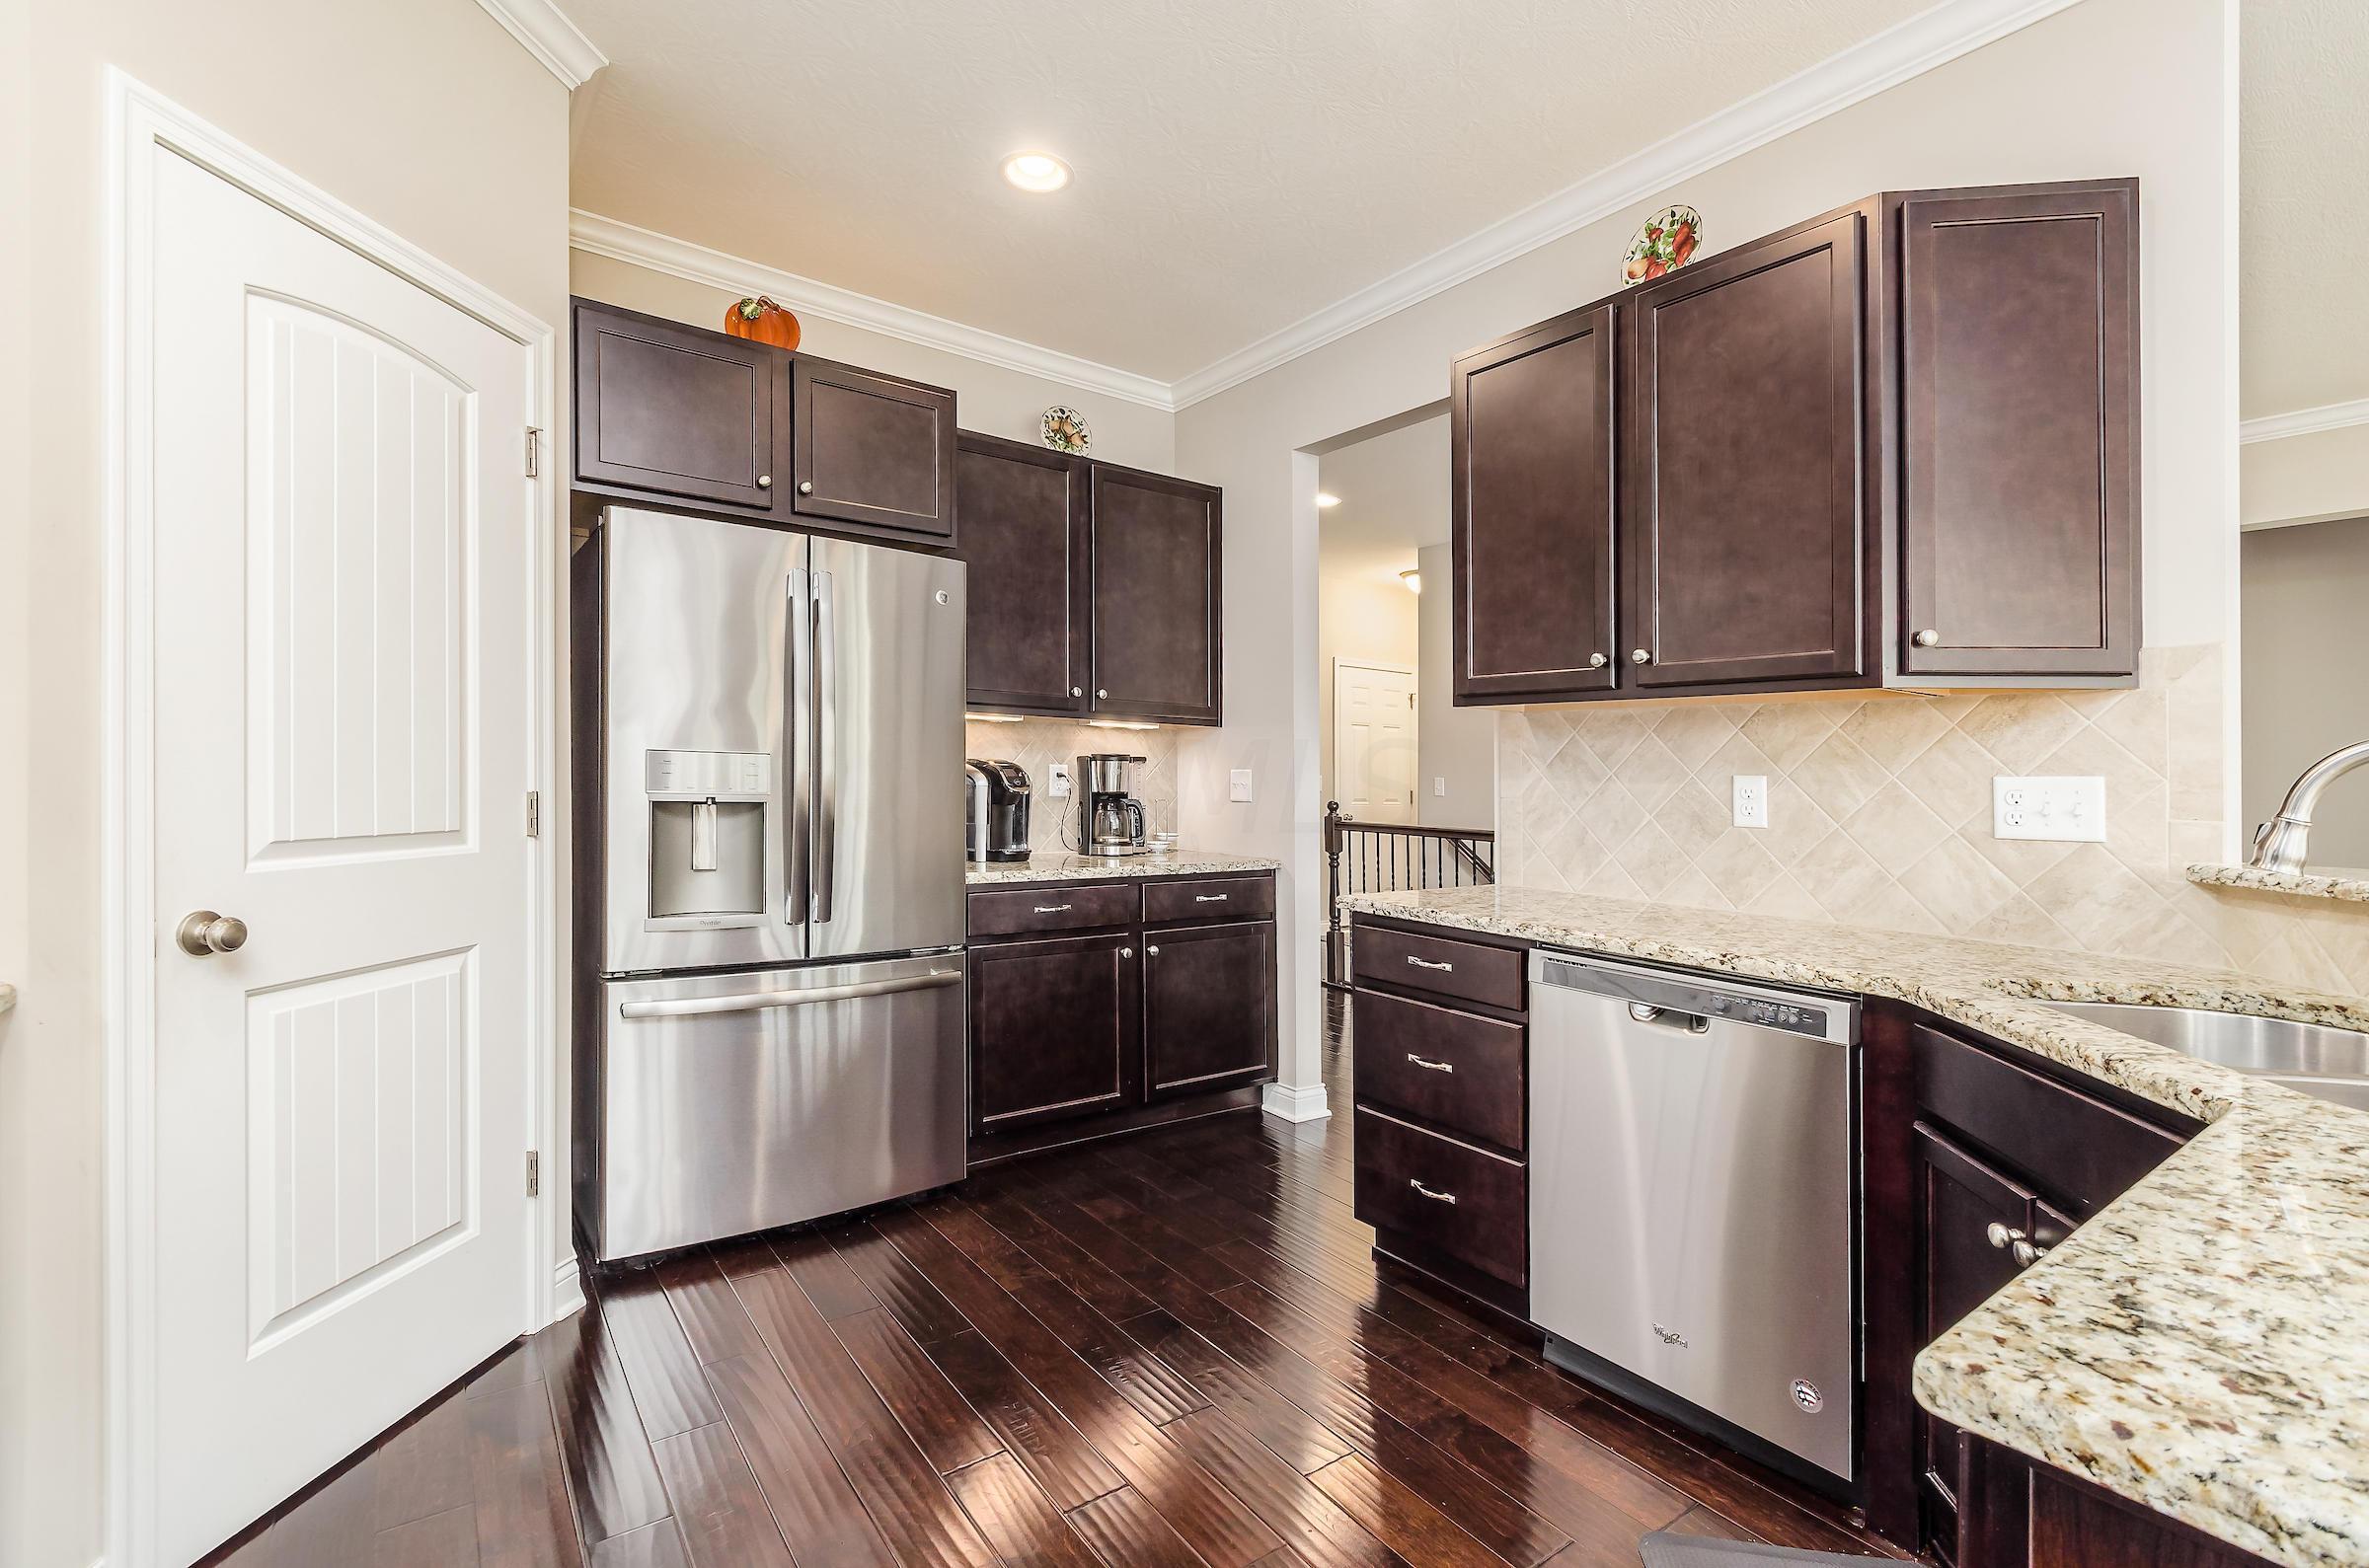 3612 Sanctuary Loop, Hilliard, Ohio 43026, 4 Bedrooms Bedrooms, ,3 BathroomsBathrooms,Residential,For Sale,Sanctuary,221000804